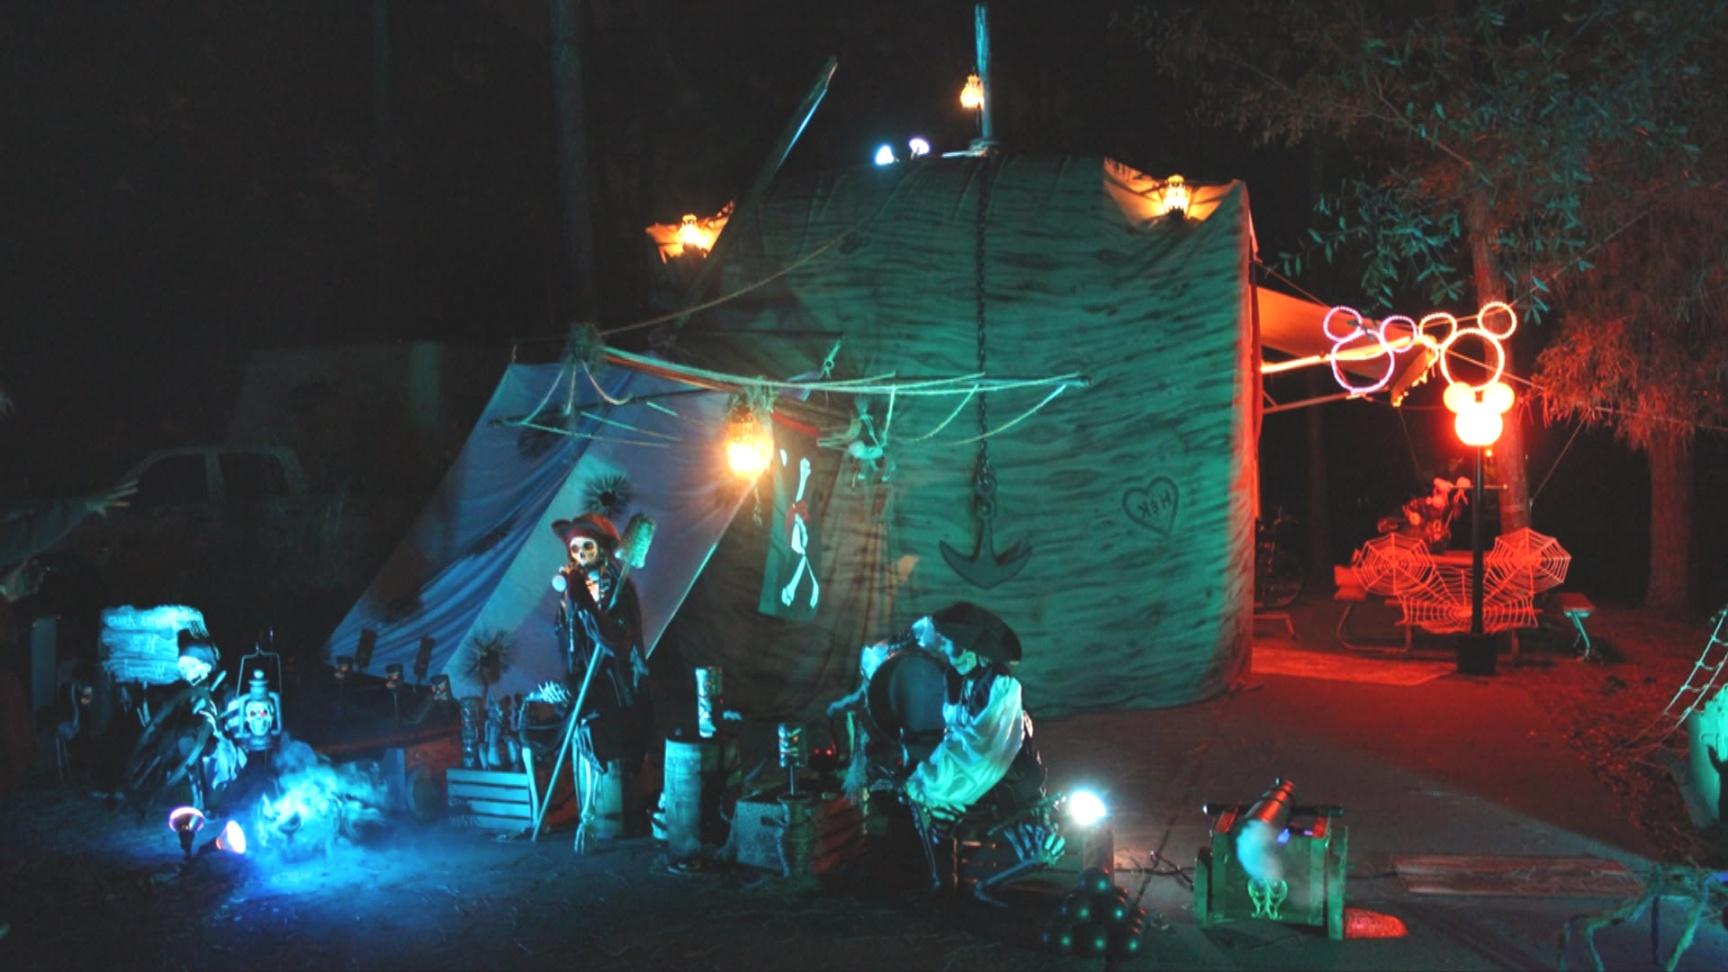 pirate themed halloween decorations | Fort Wilderness Halloween Site Decoration 2012 Winner, Walt Disney ..